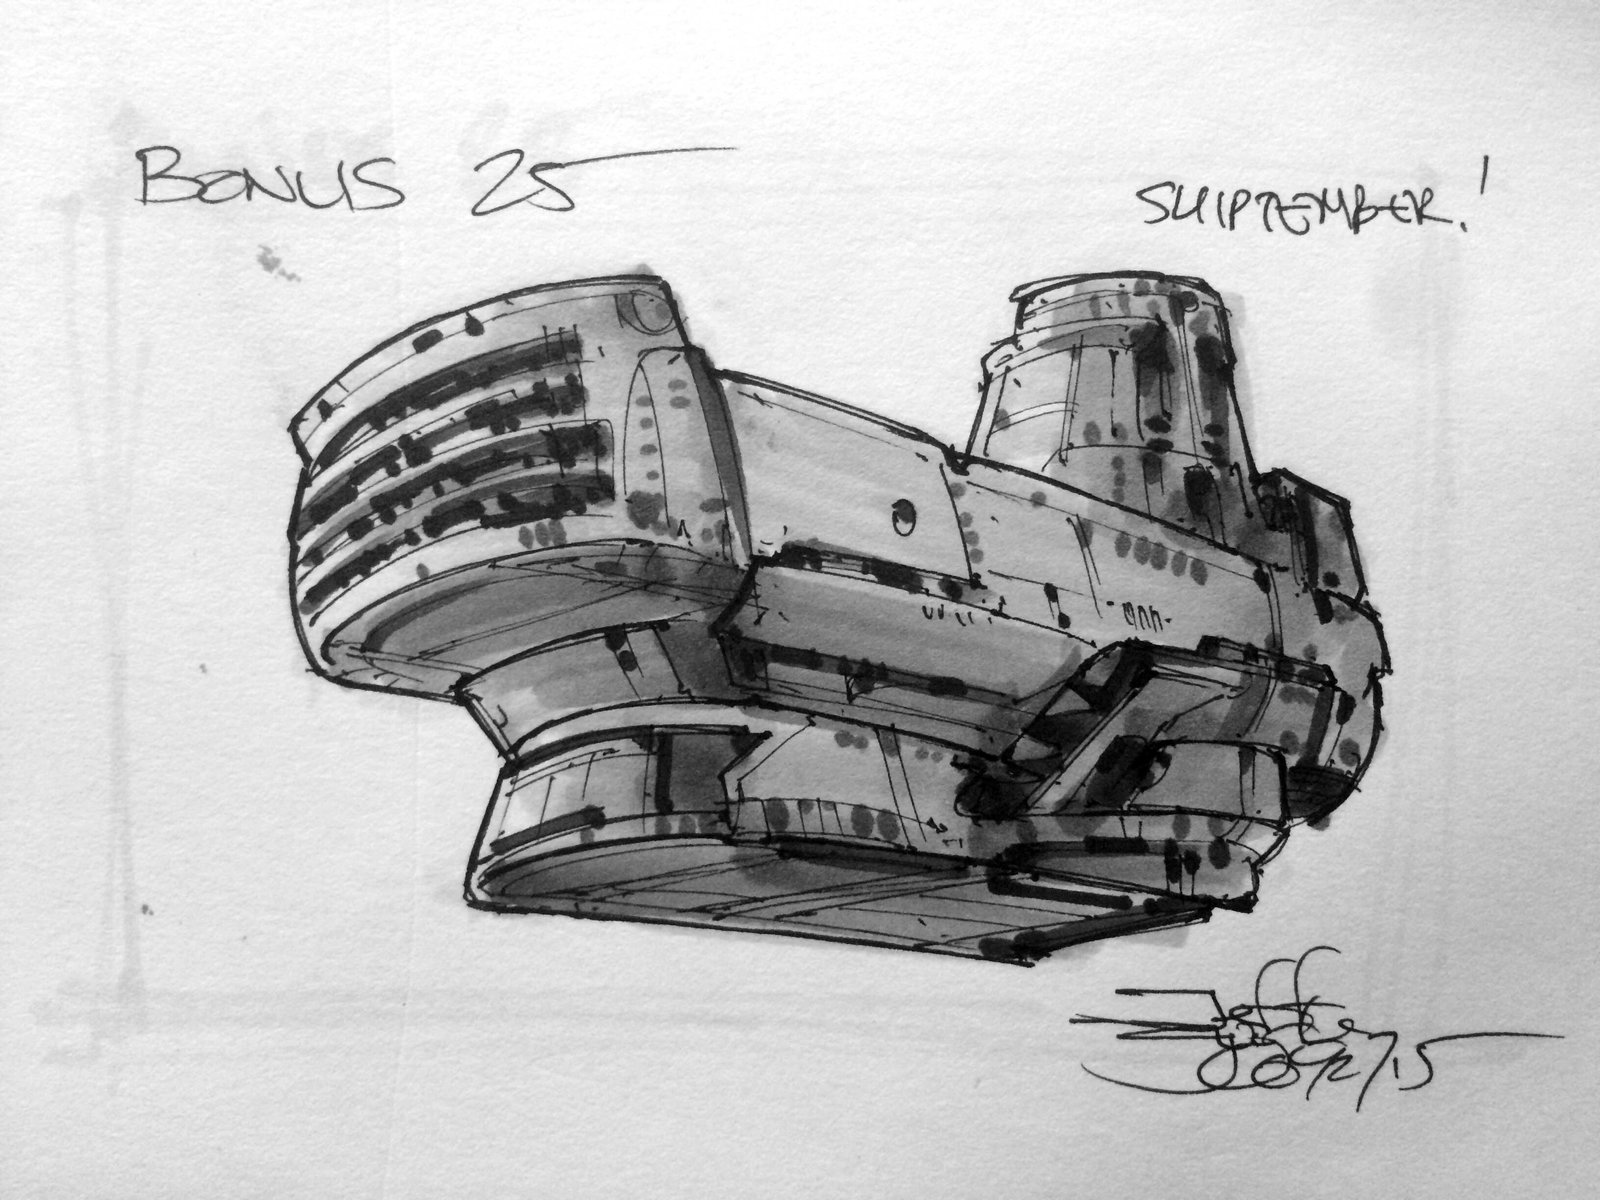 Shiptember Bonus 25